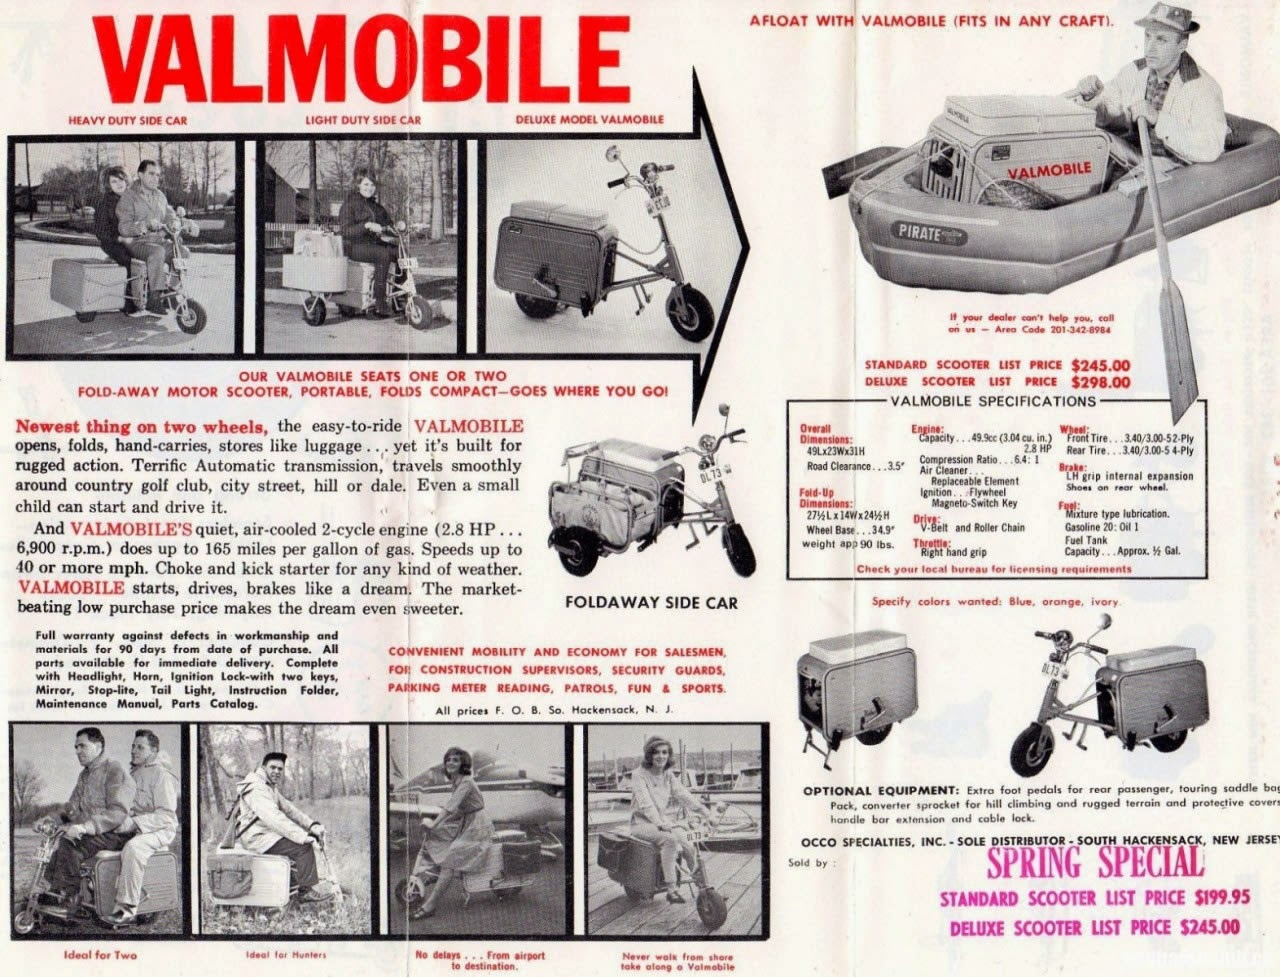 Valmobile Foldaway Motor Scooter Bikermetric